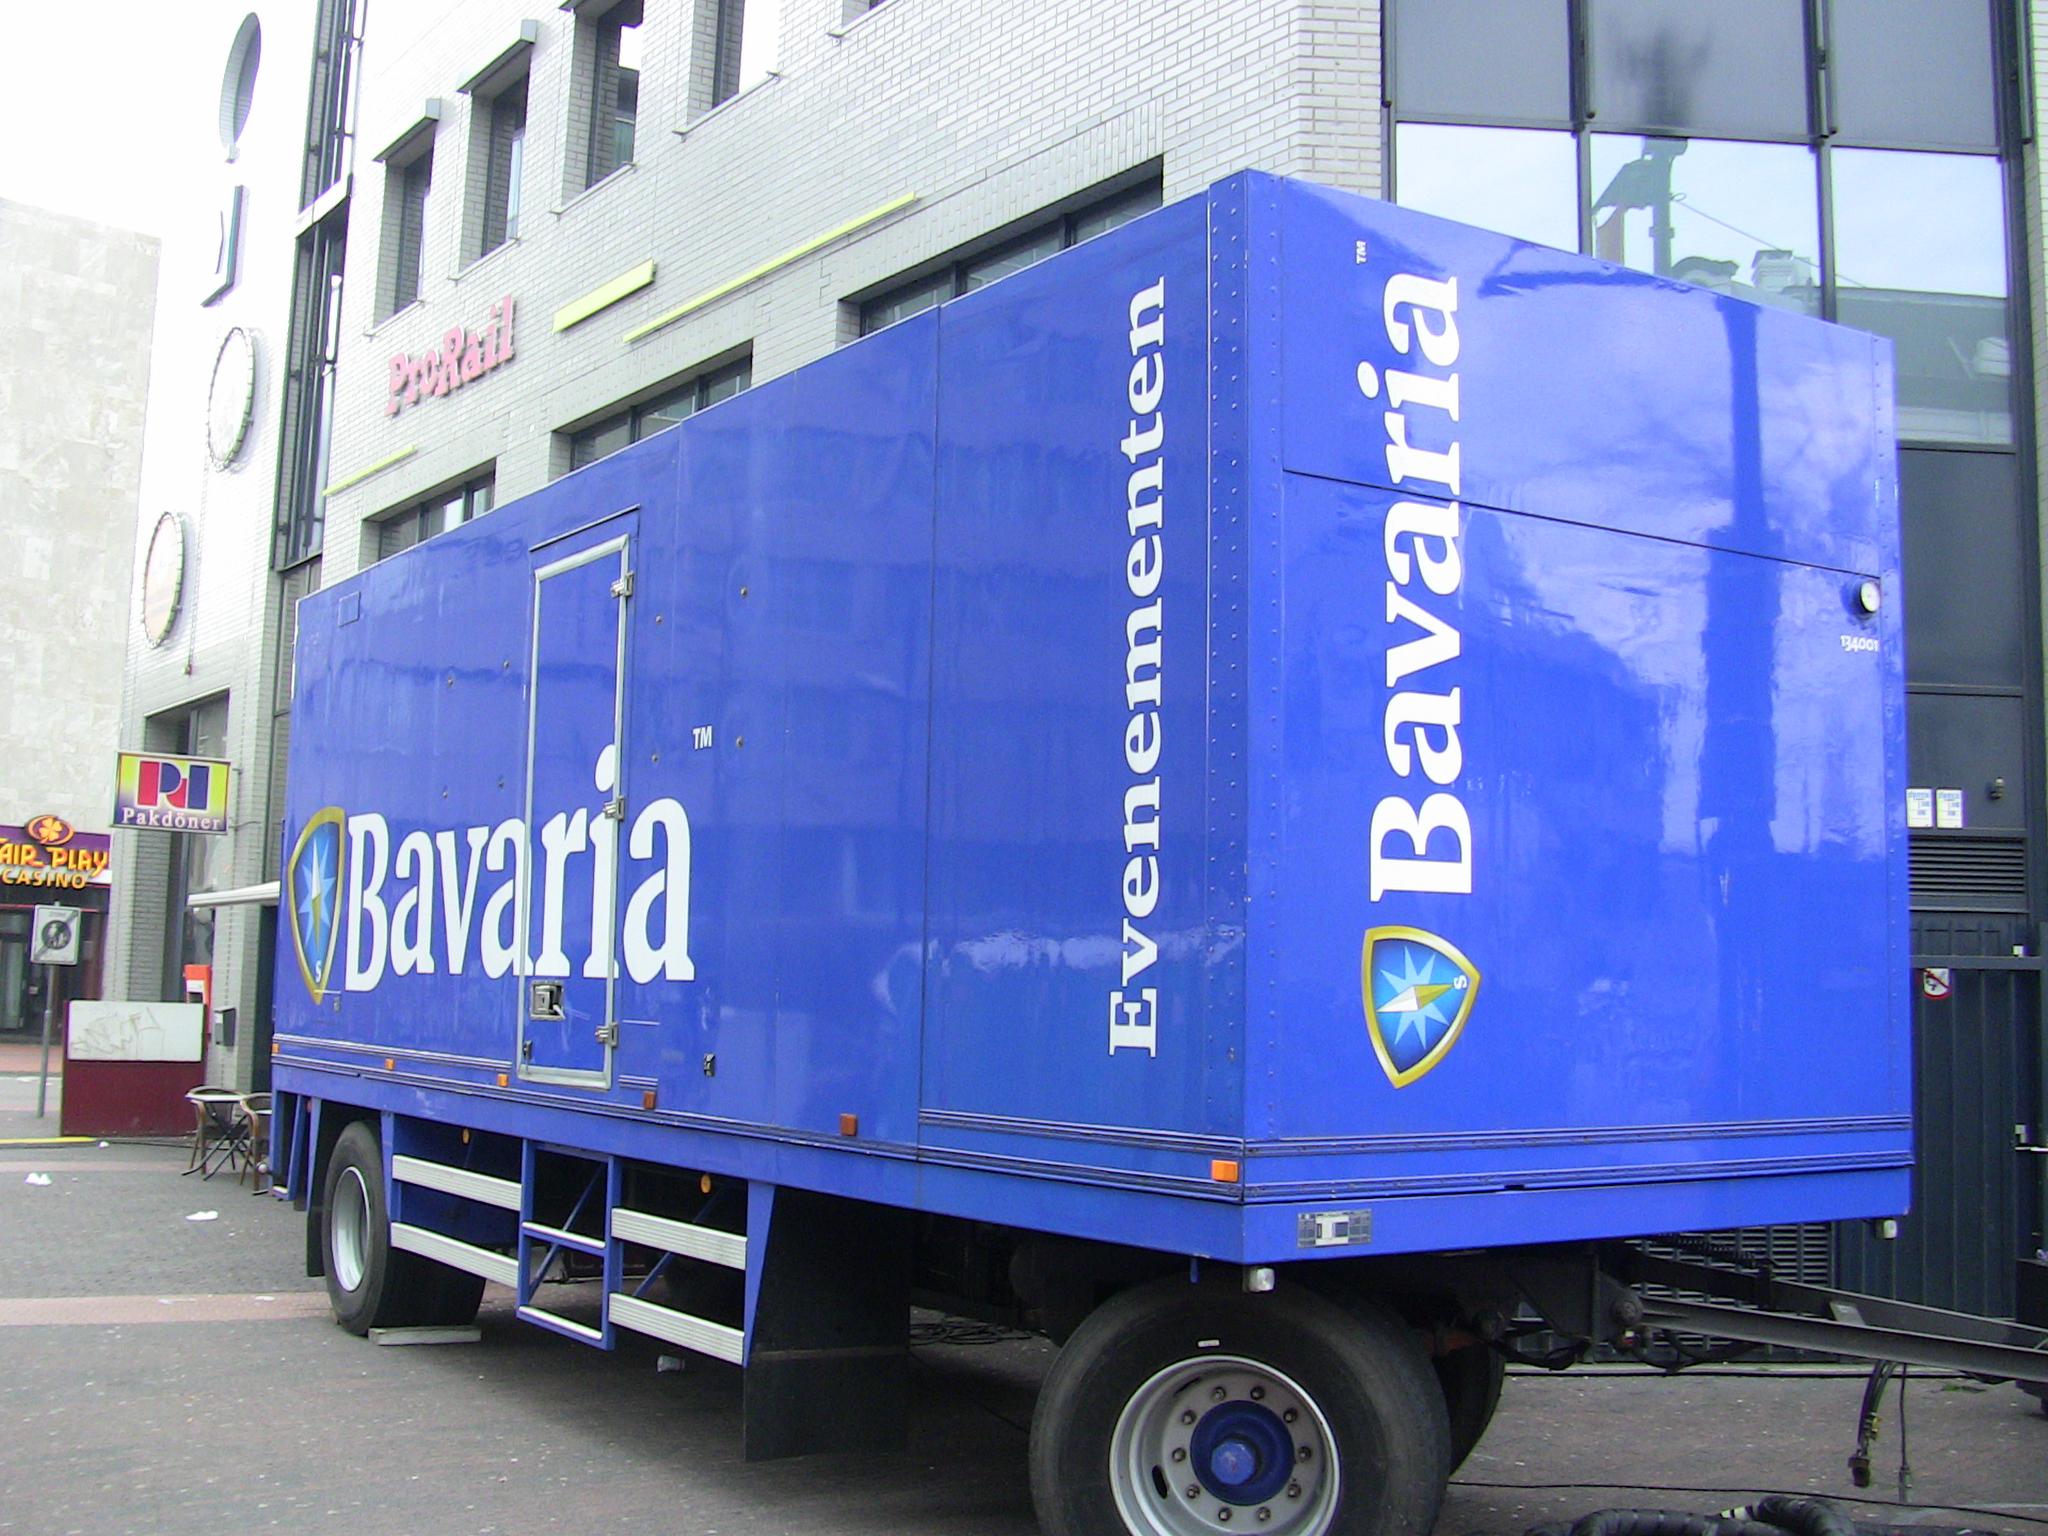 Bavaria Truck